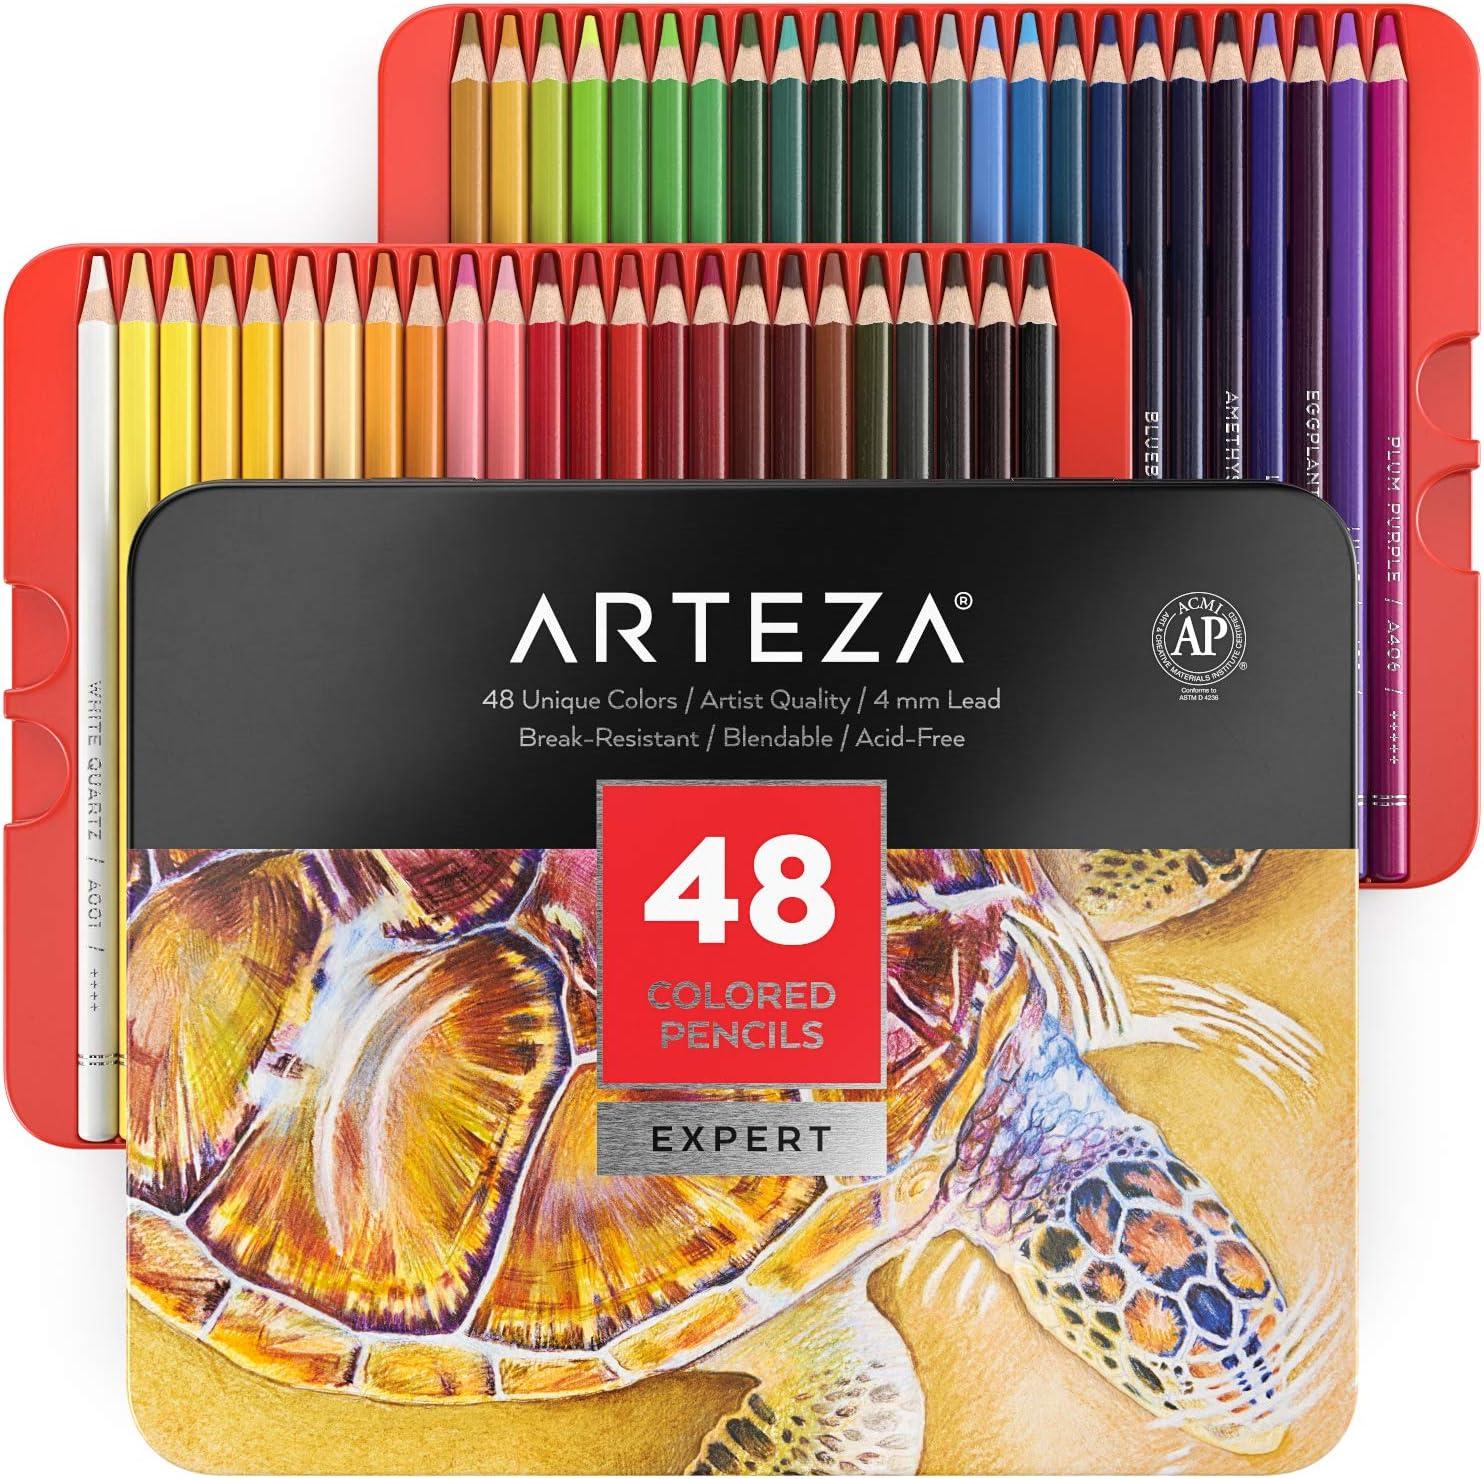 Blending Shading /& Rendering Prismacolor Premier Soft Core Colored Set of 48 Pencils; Drawing Prismacolor Arts Crafts